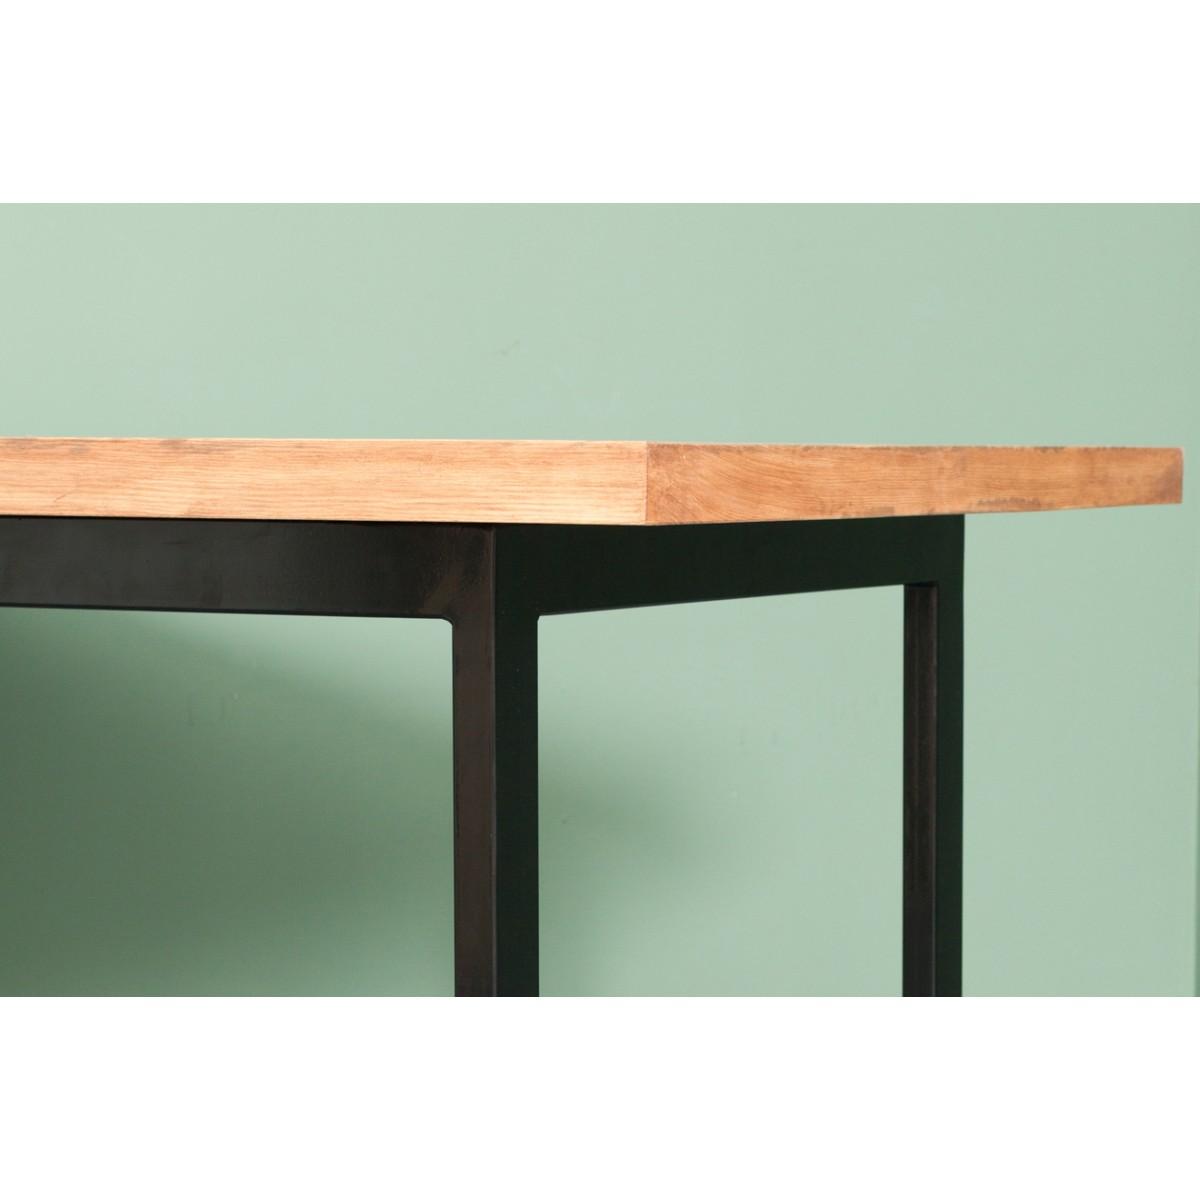 JOHANENLIES | Upcycling Tisch aus recyceltem Massivholz & Eisen | ONDERBANKEN